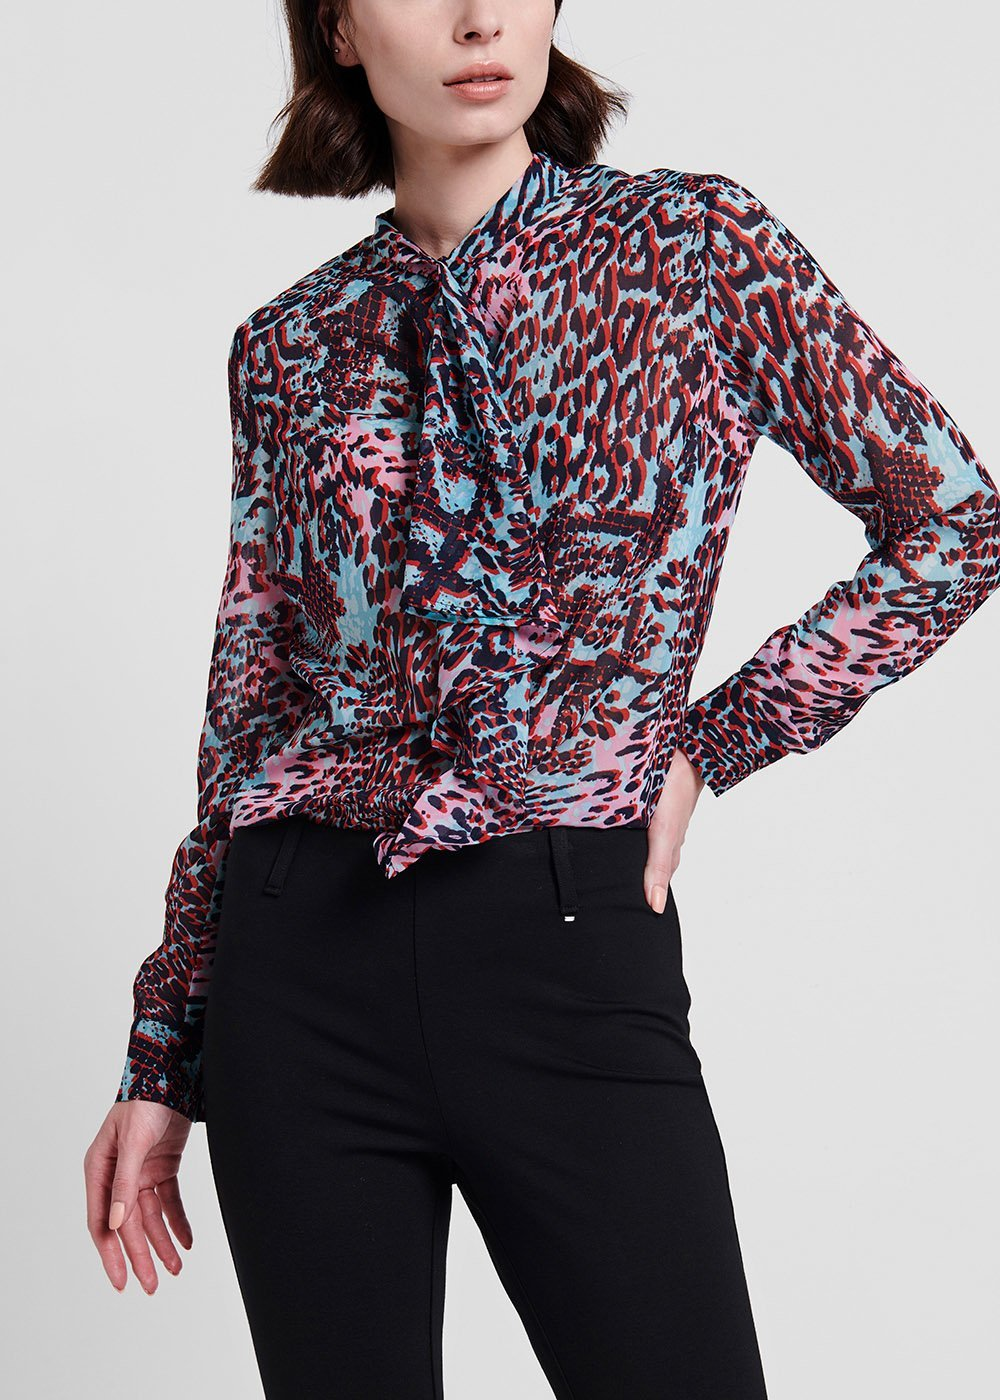 Carola shirt with 3D effect - Laguna /  Black Animalier - Woman